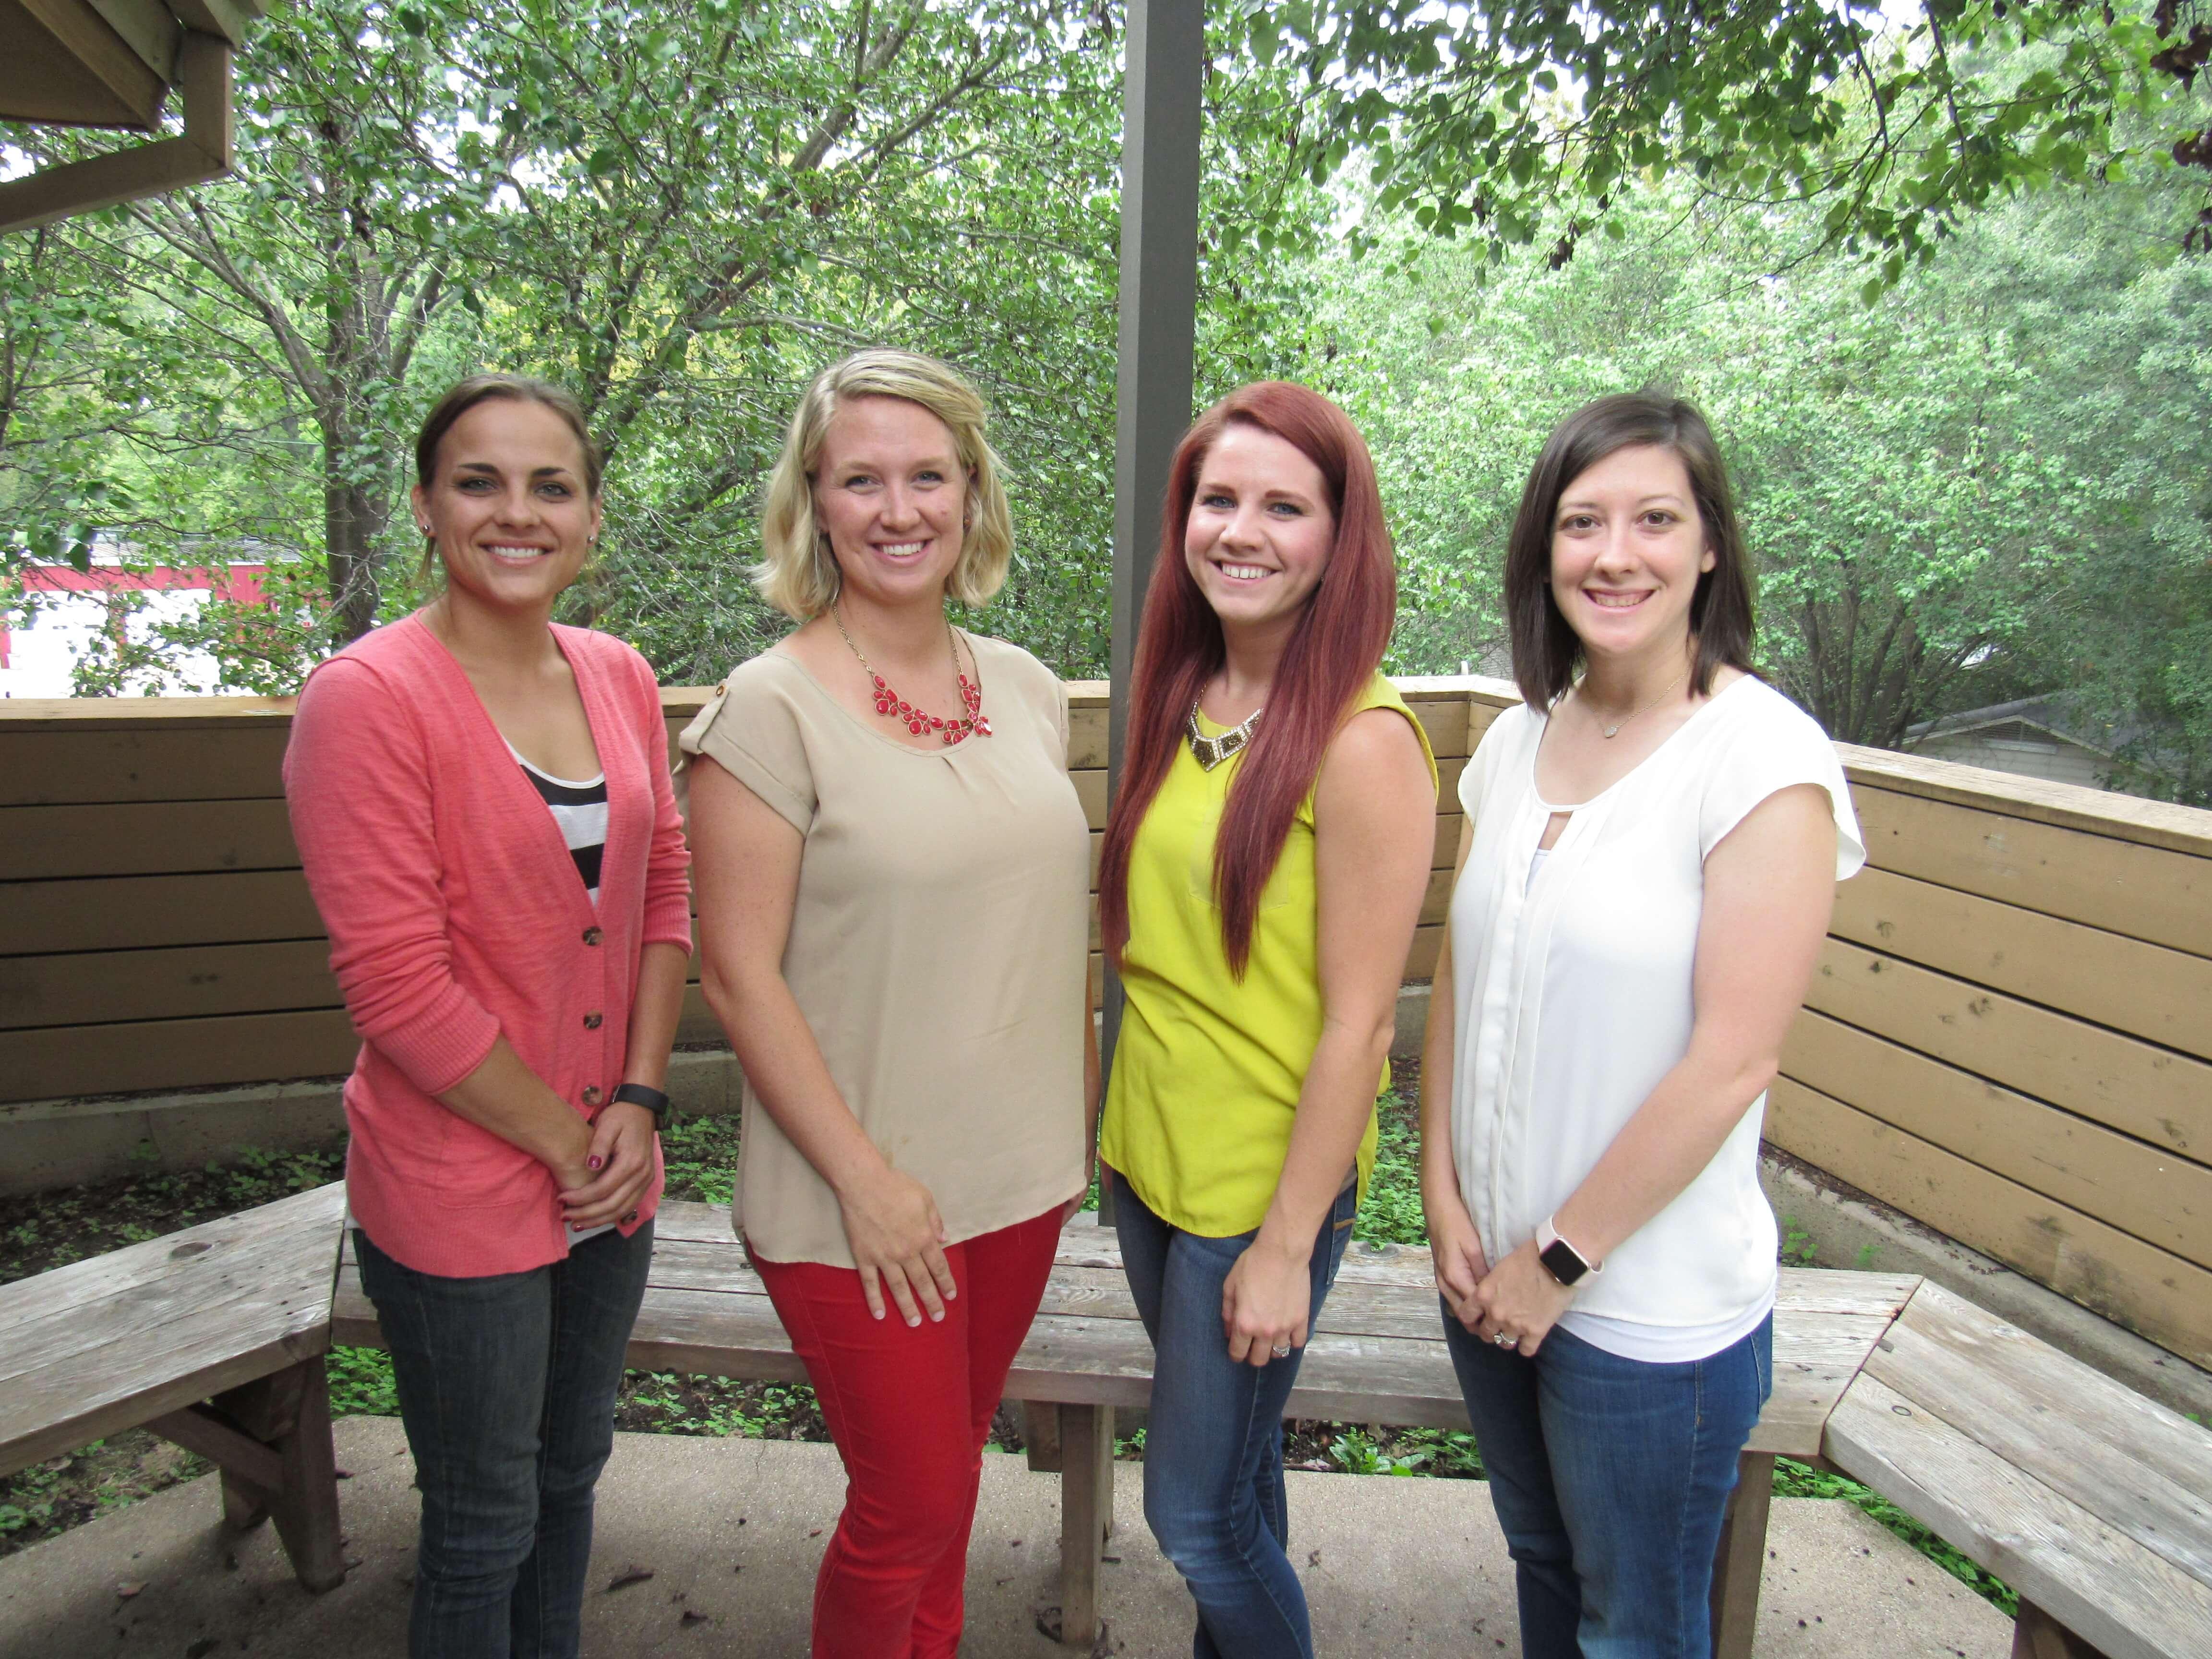 Brittany Jordan, Whitney Sherman, Rachel Massey, Mollie Eaton